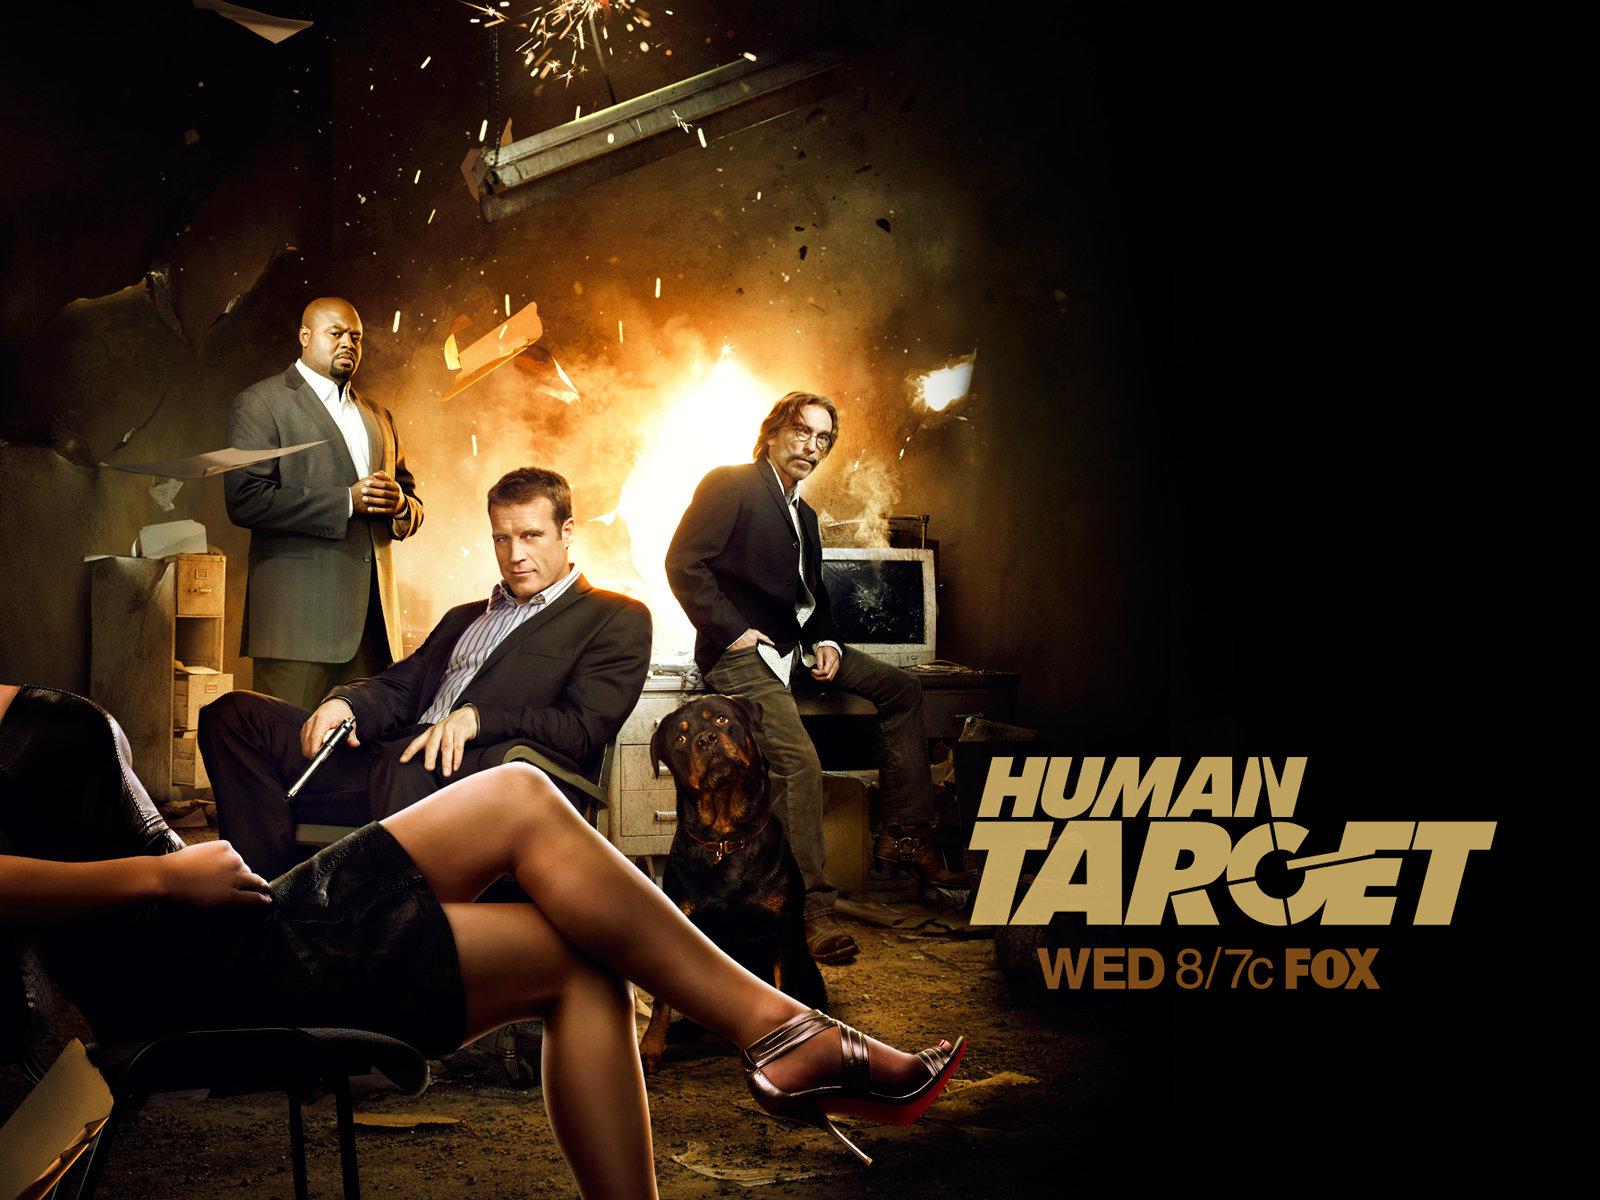 Human Target (TV Series 2010–2011) - IMDb